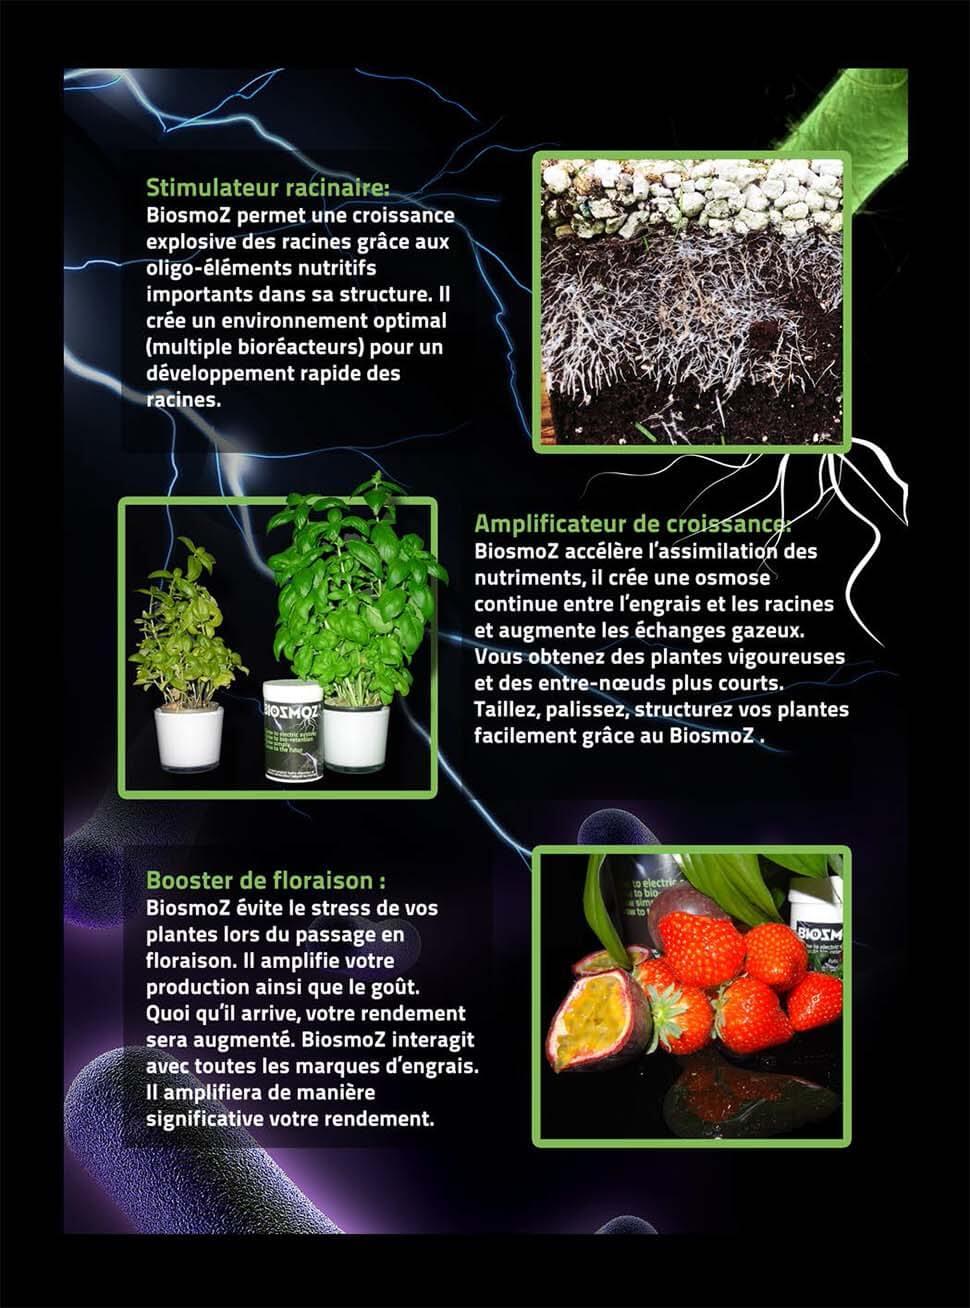 effets booster de biosmoz en image